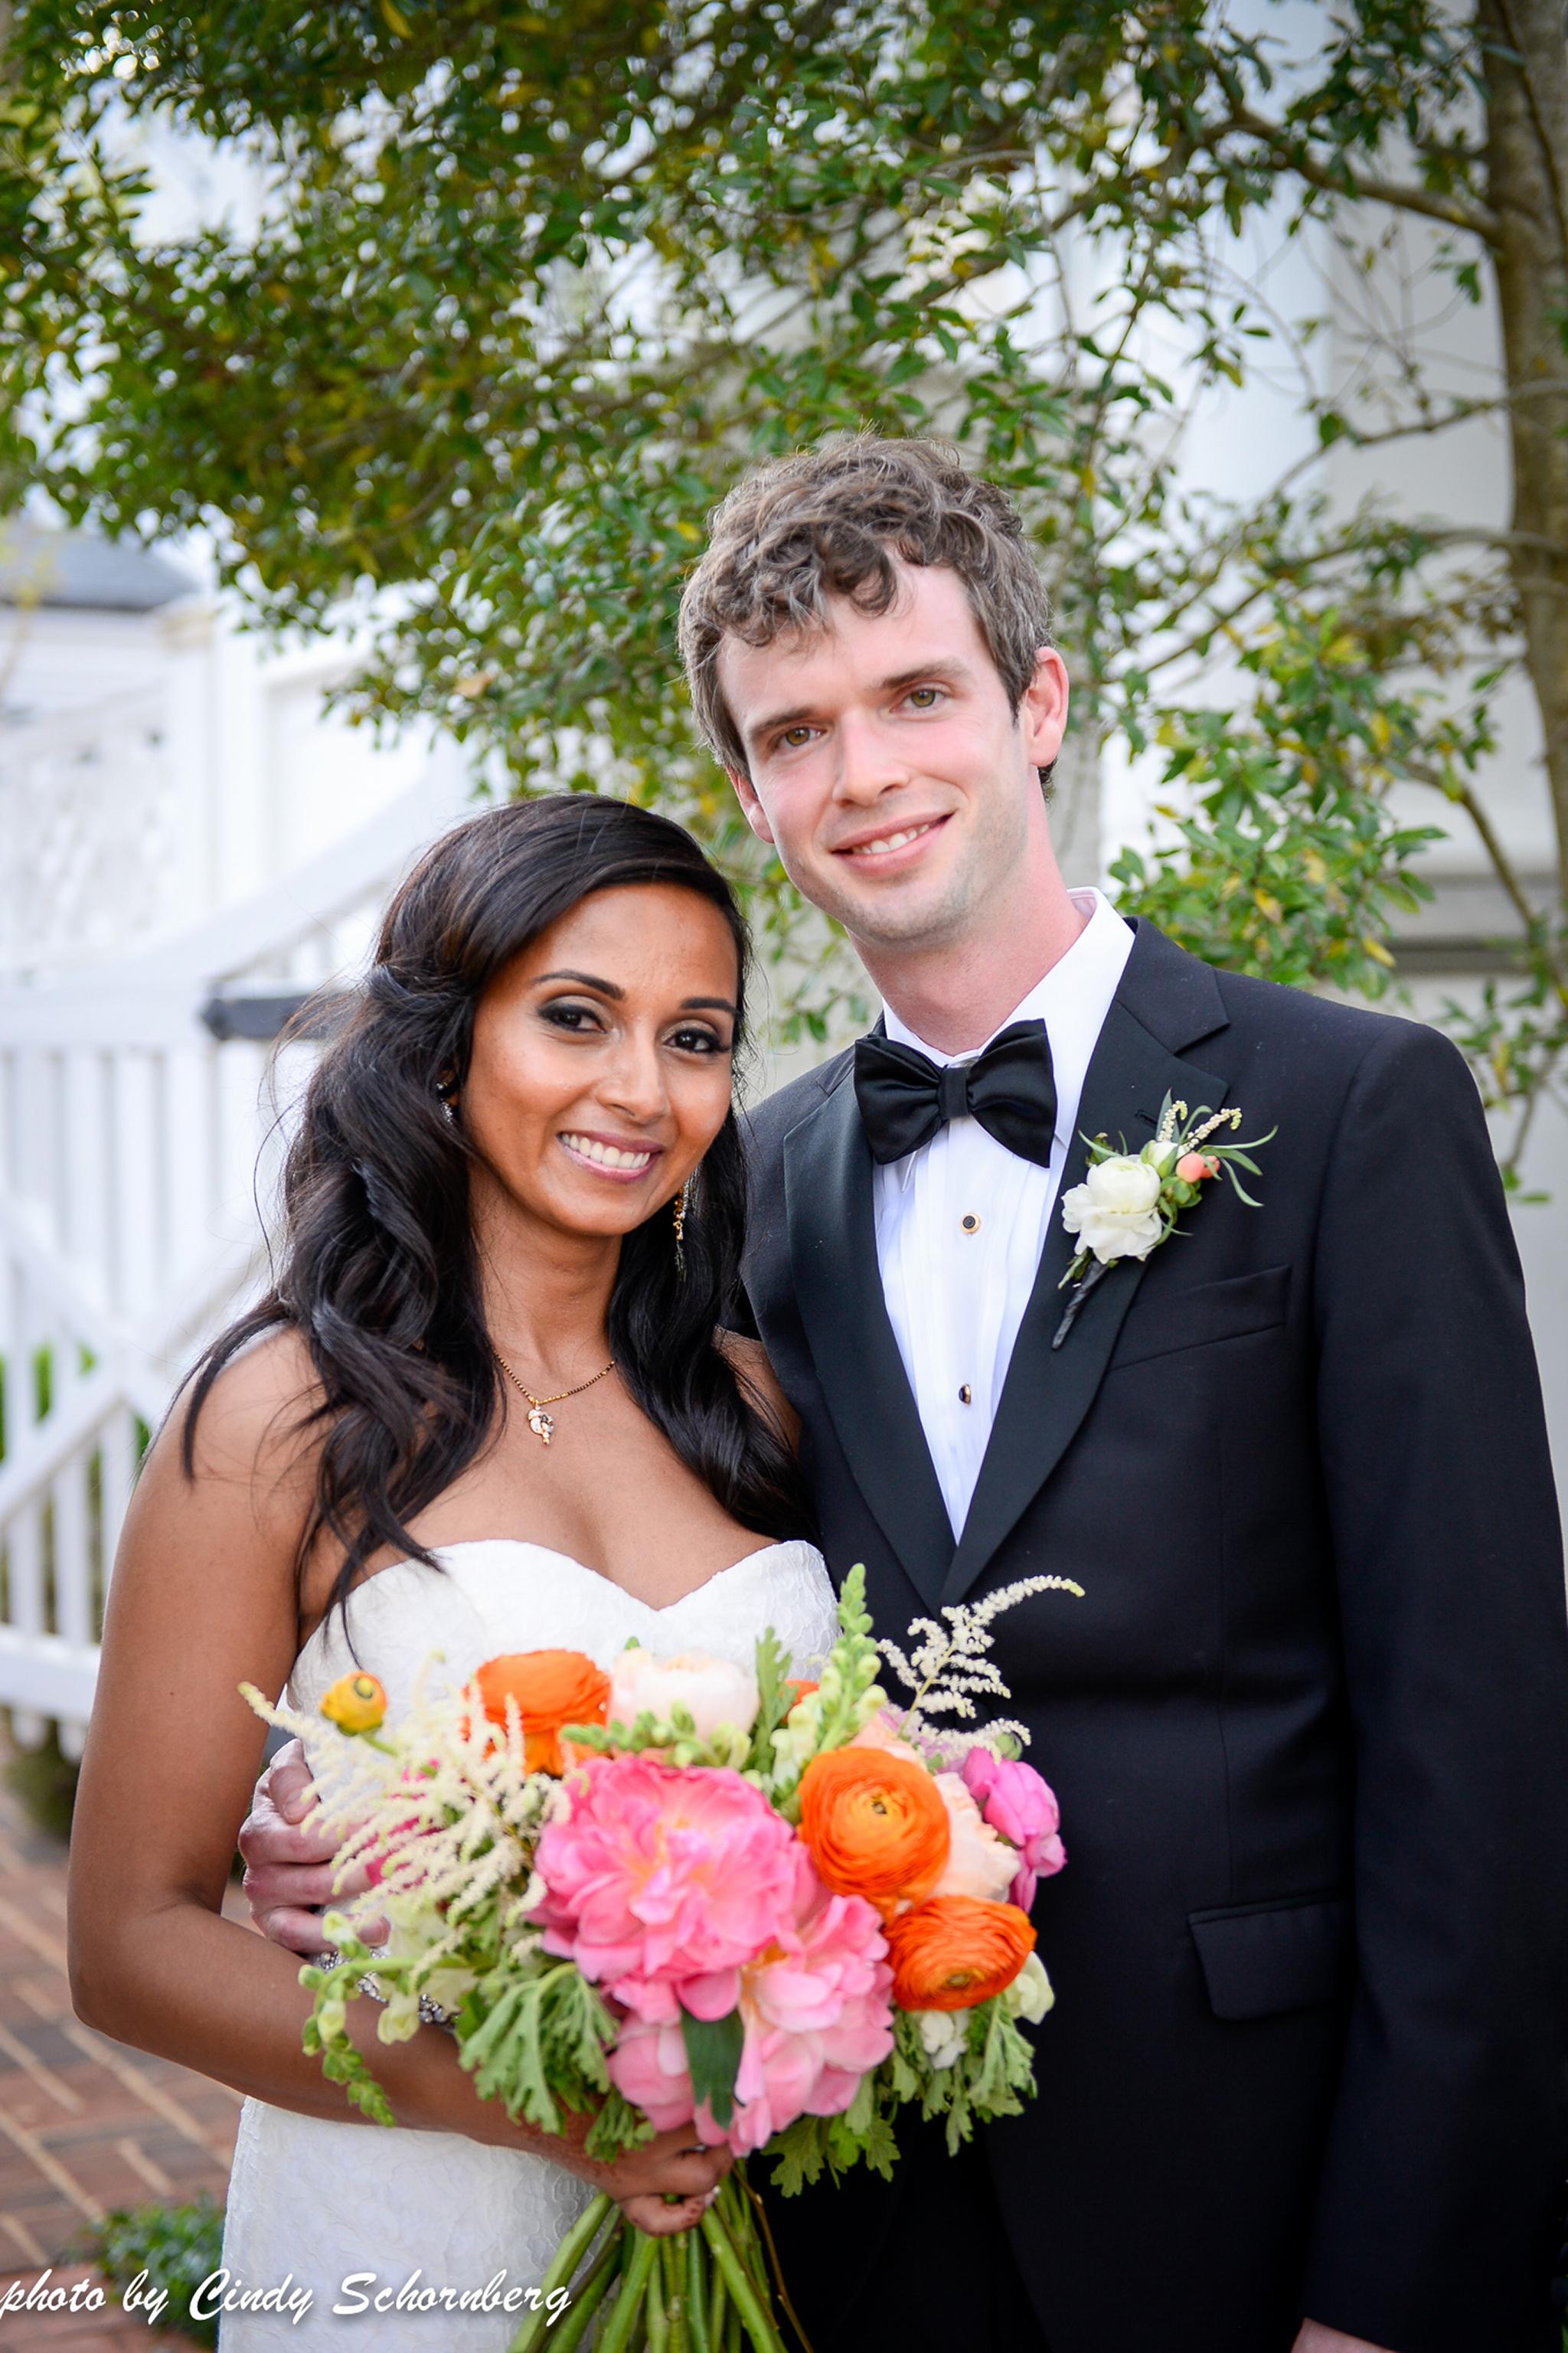 vineyard_weddings_Charlottesville_Virginia_011.jpg